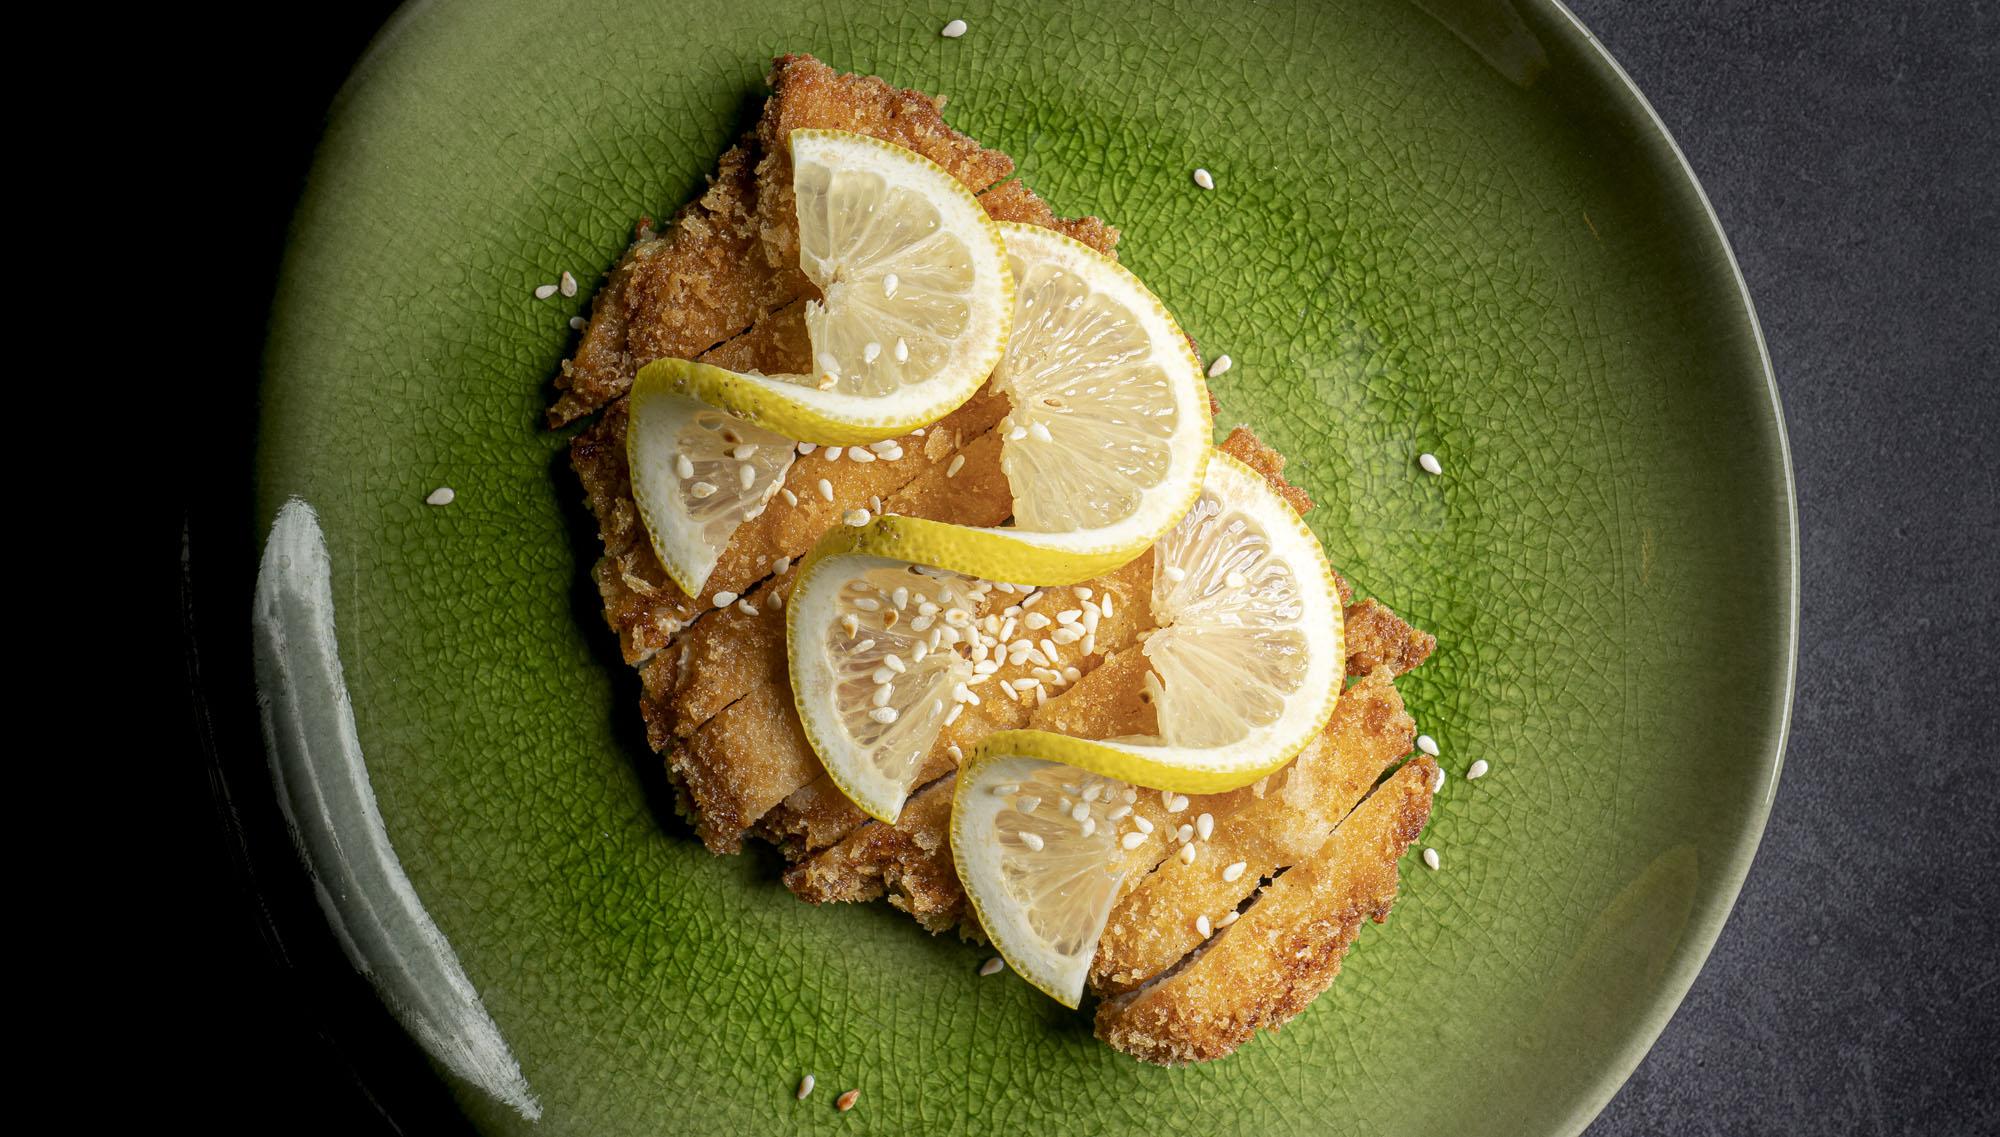 檸檬雞片 | Poulet croustillant à la sauce citron